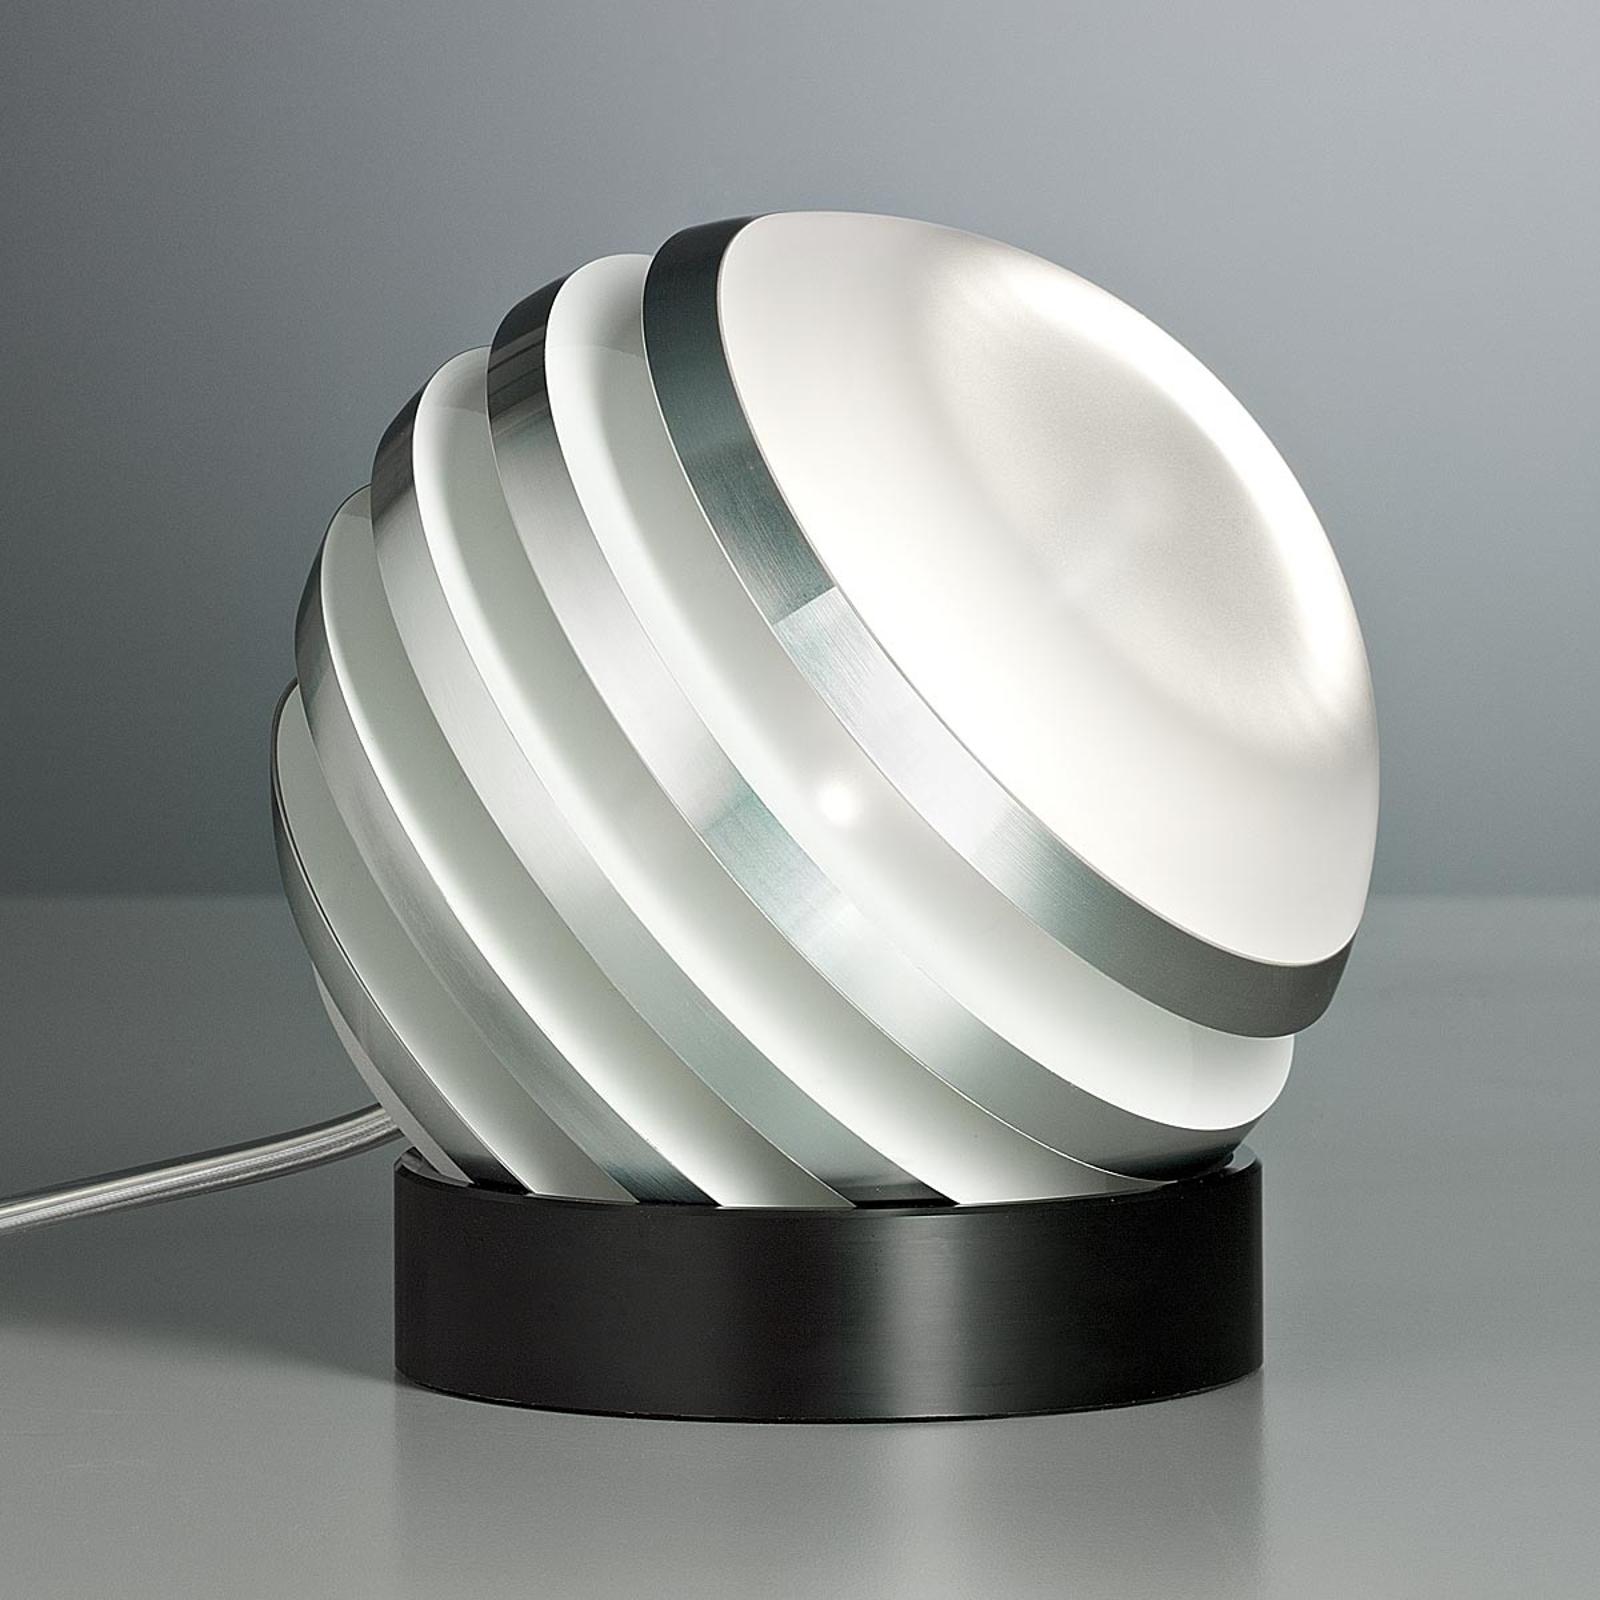 Lampe à poser LED BULO blanche